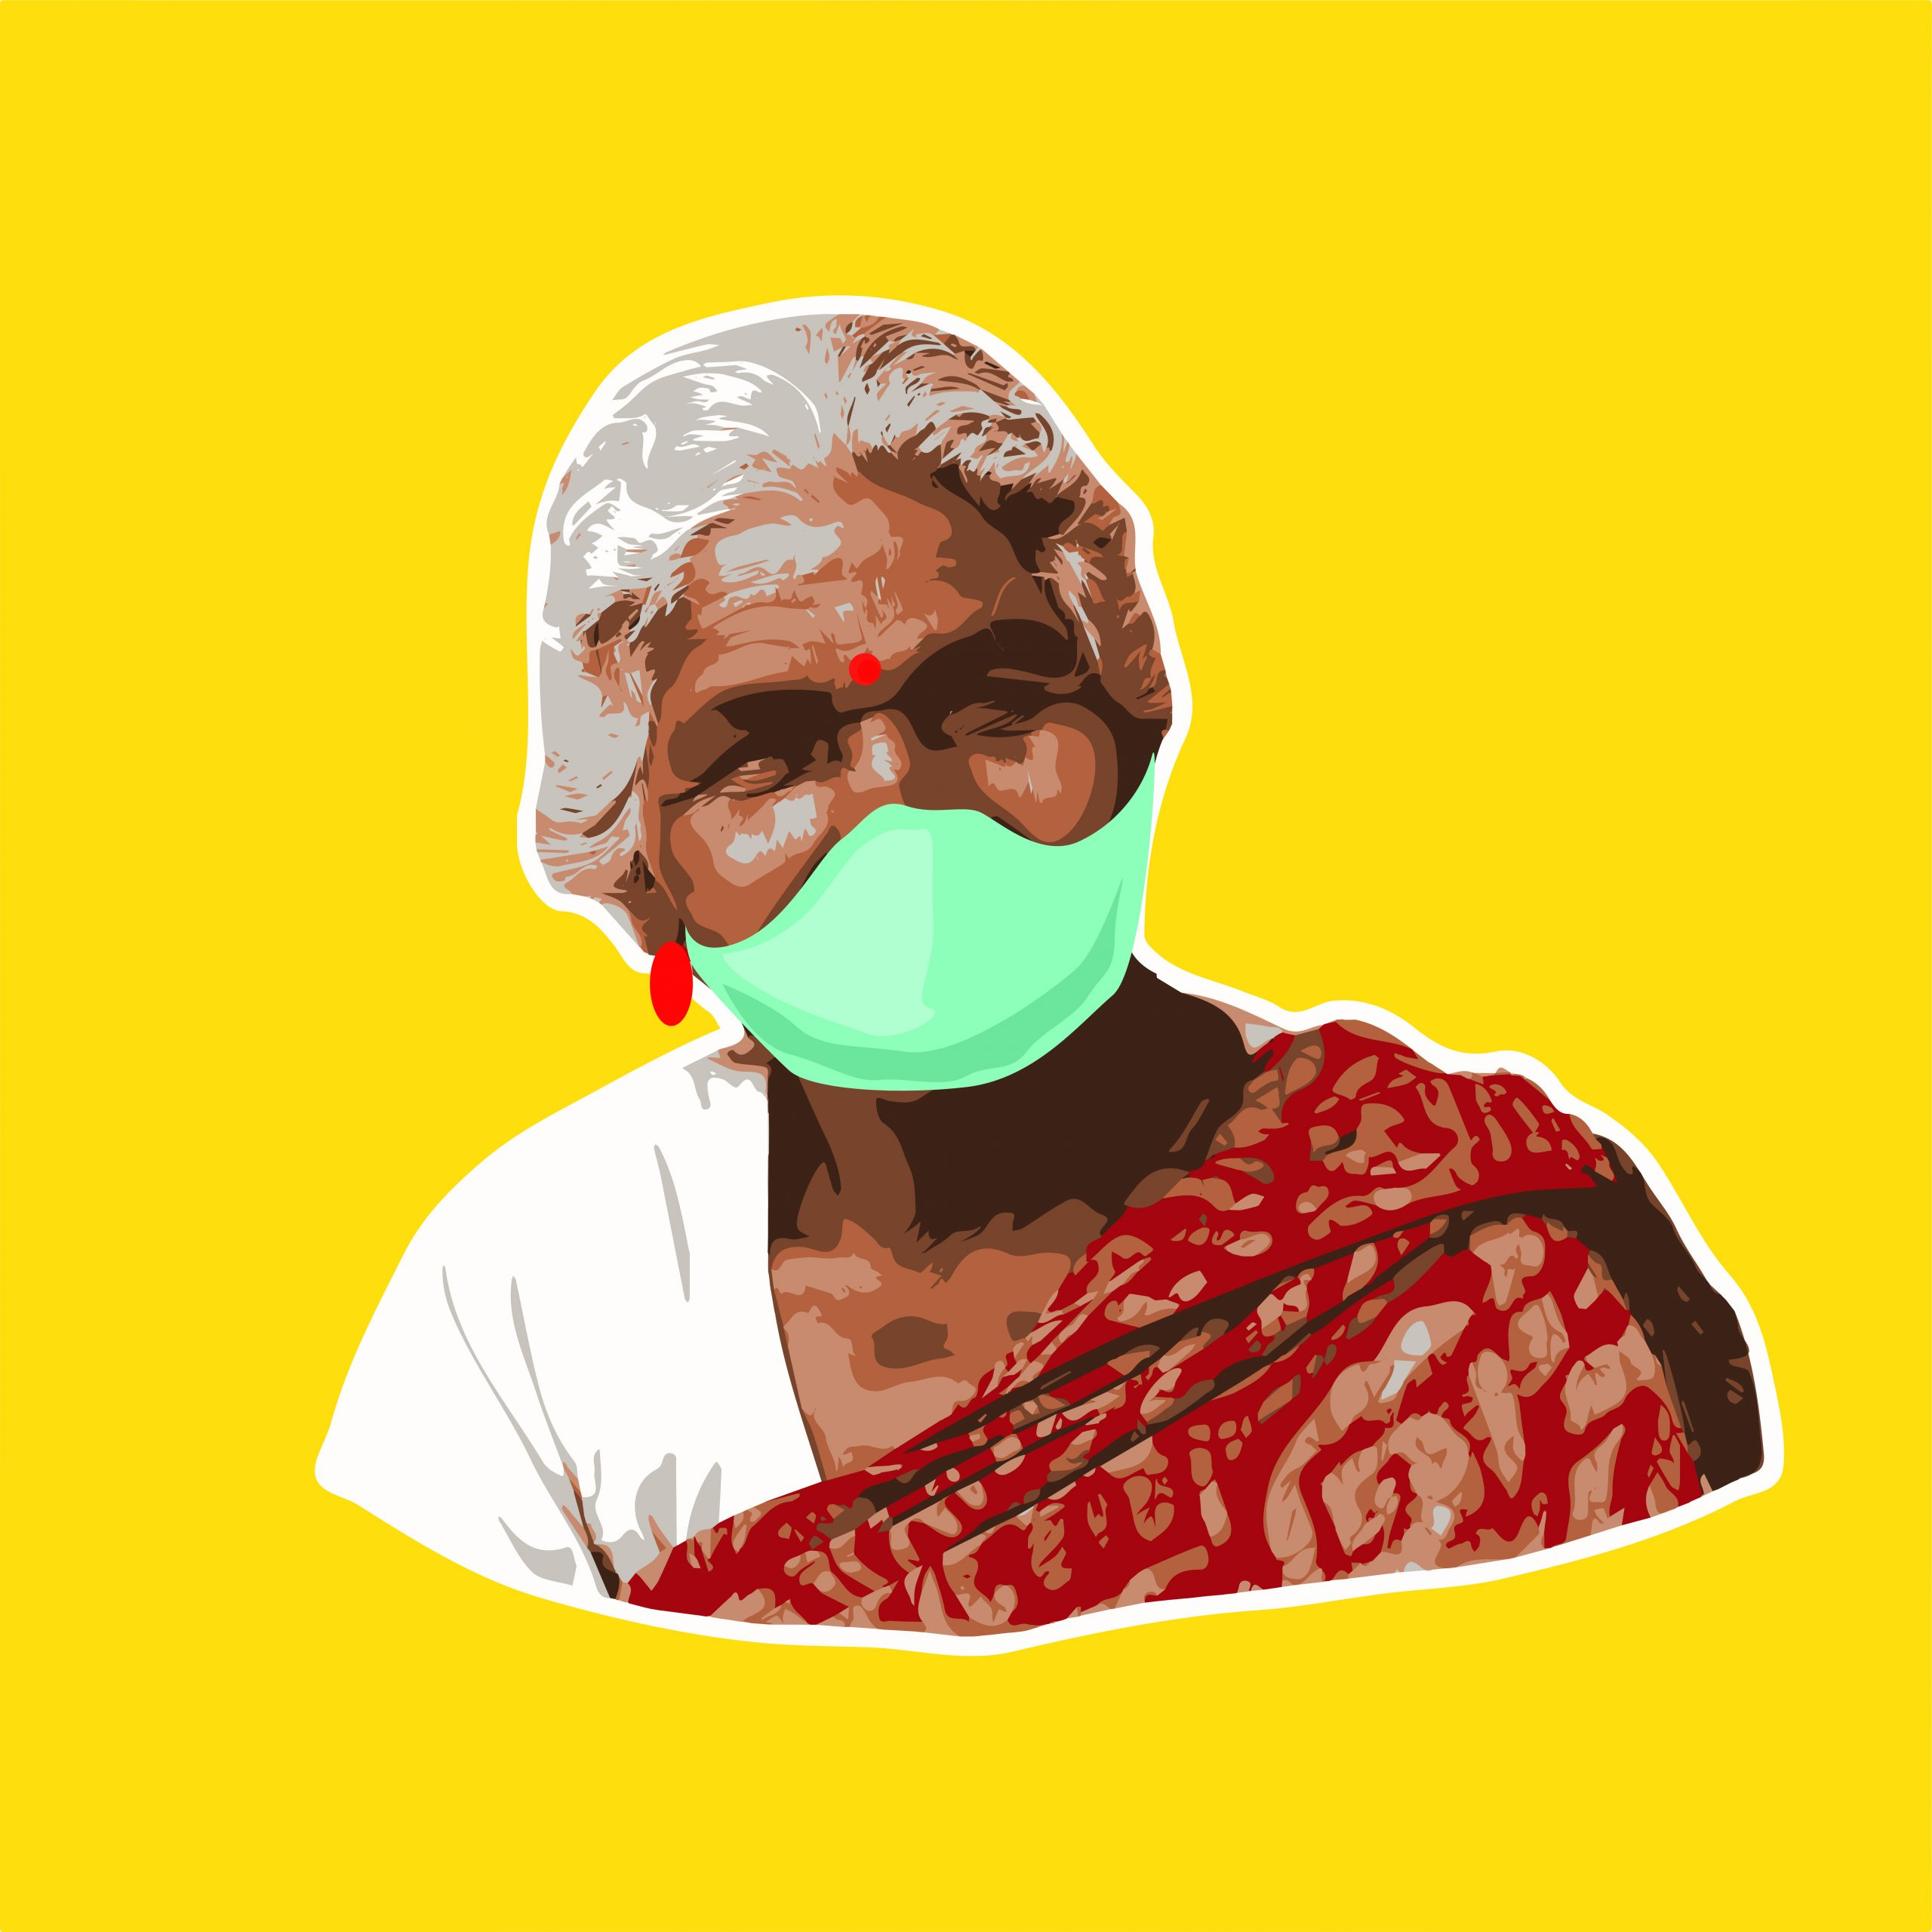 Old lady face Portrait Illustration